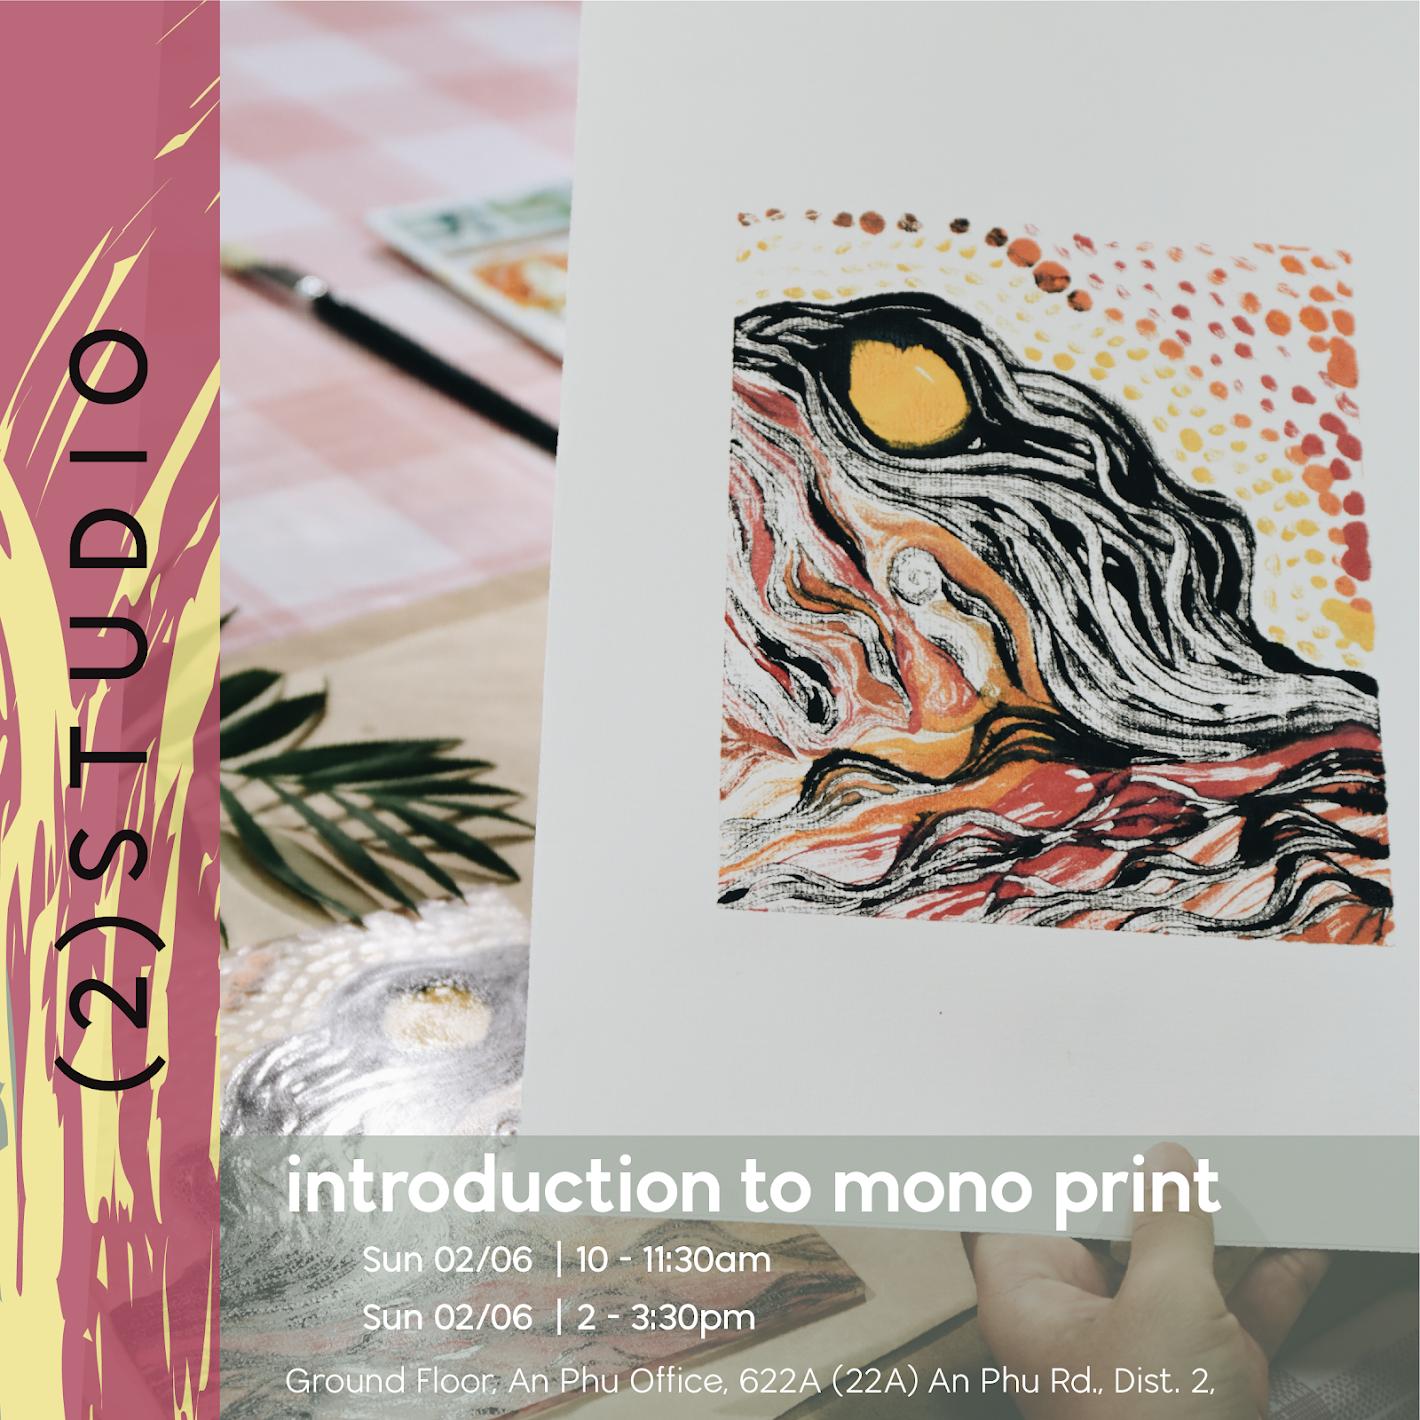 intro to mono print workshop -instagram1.png